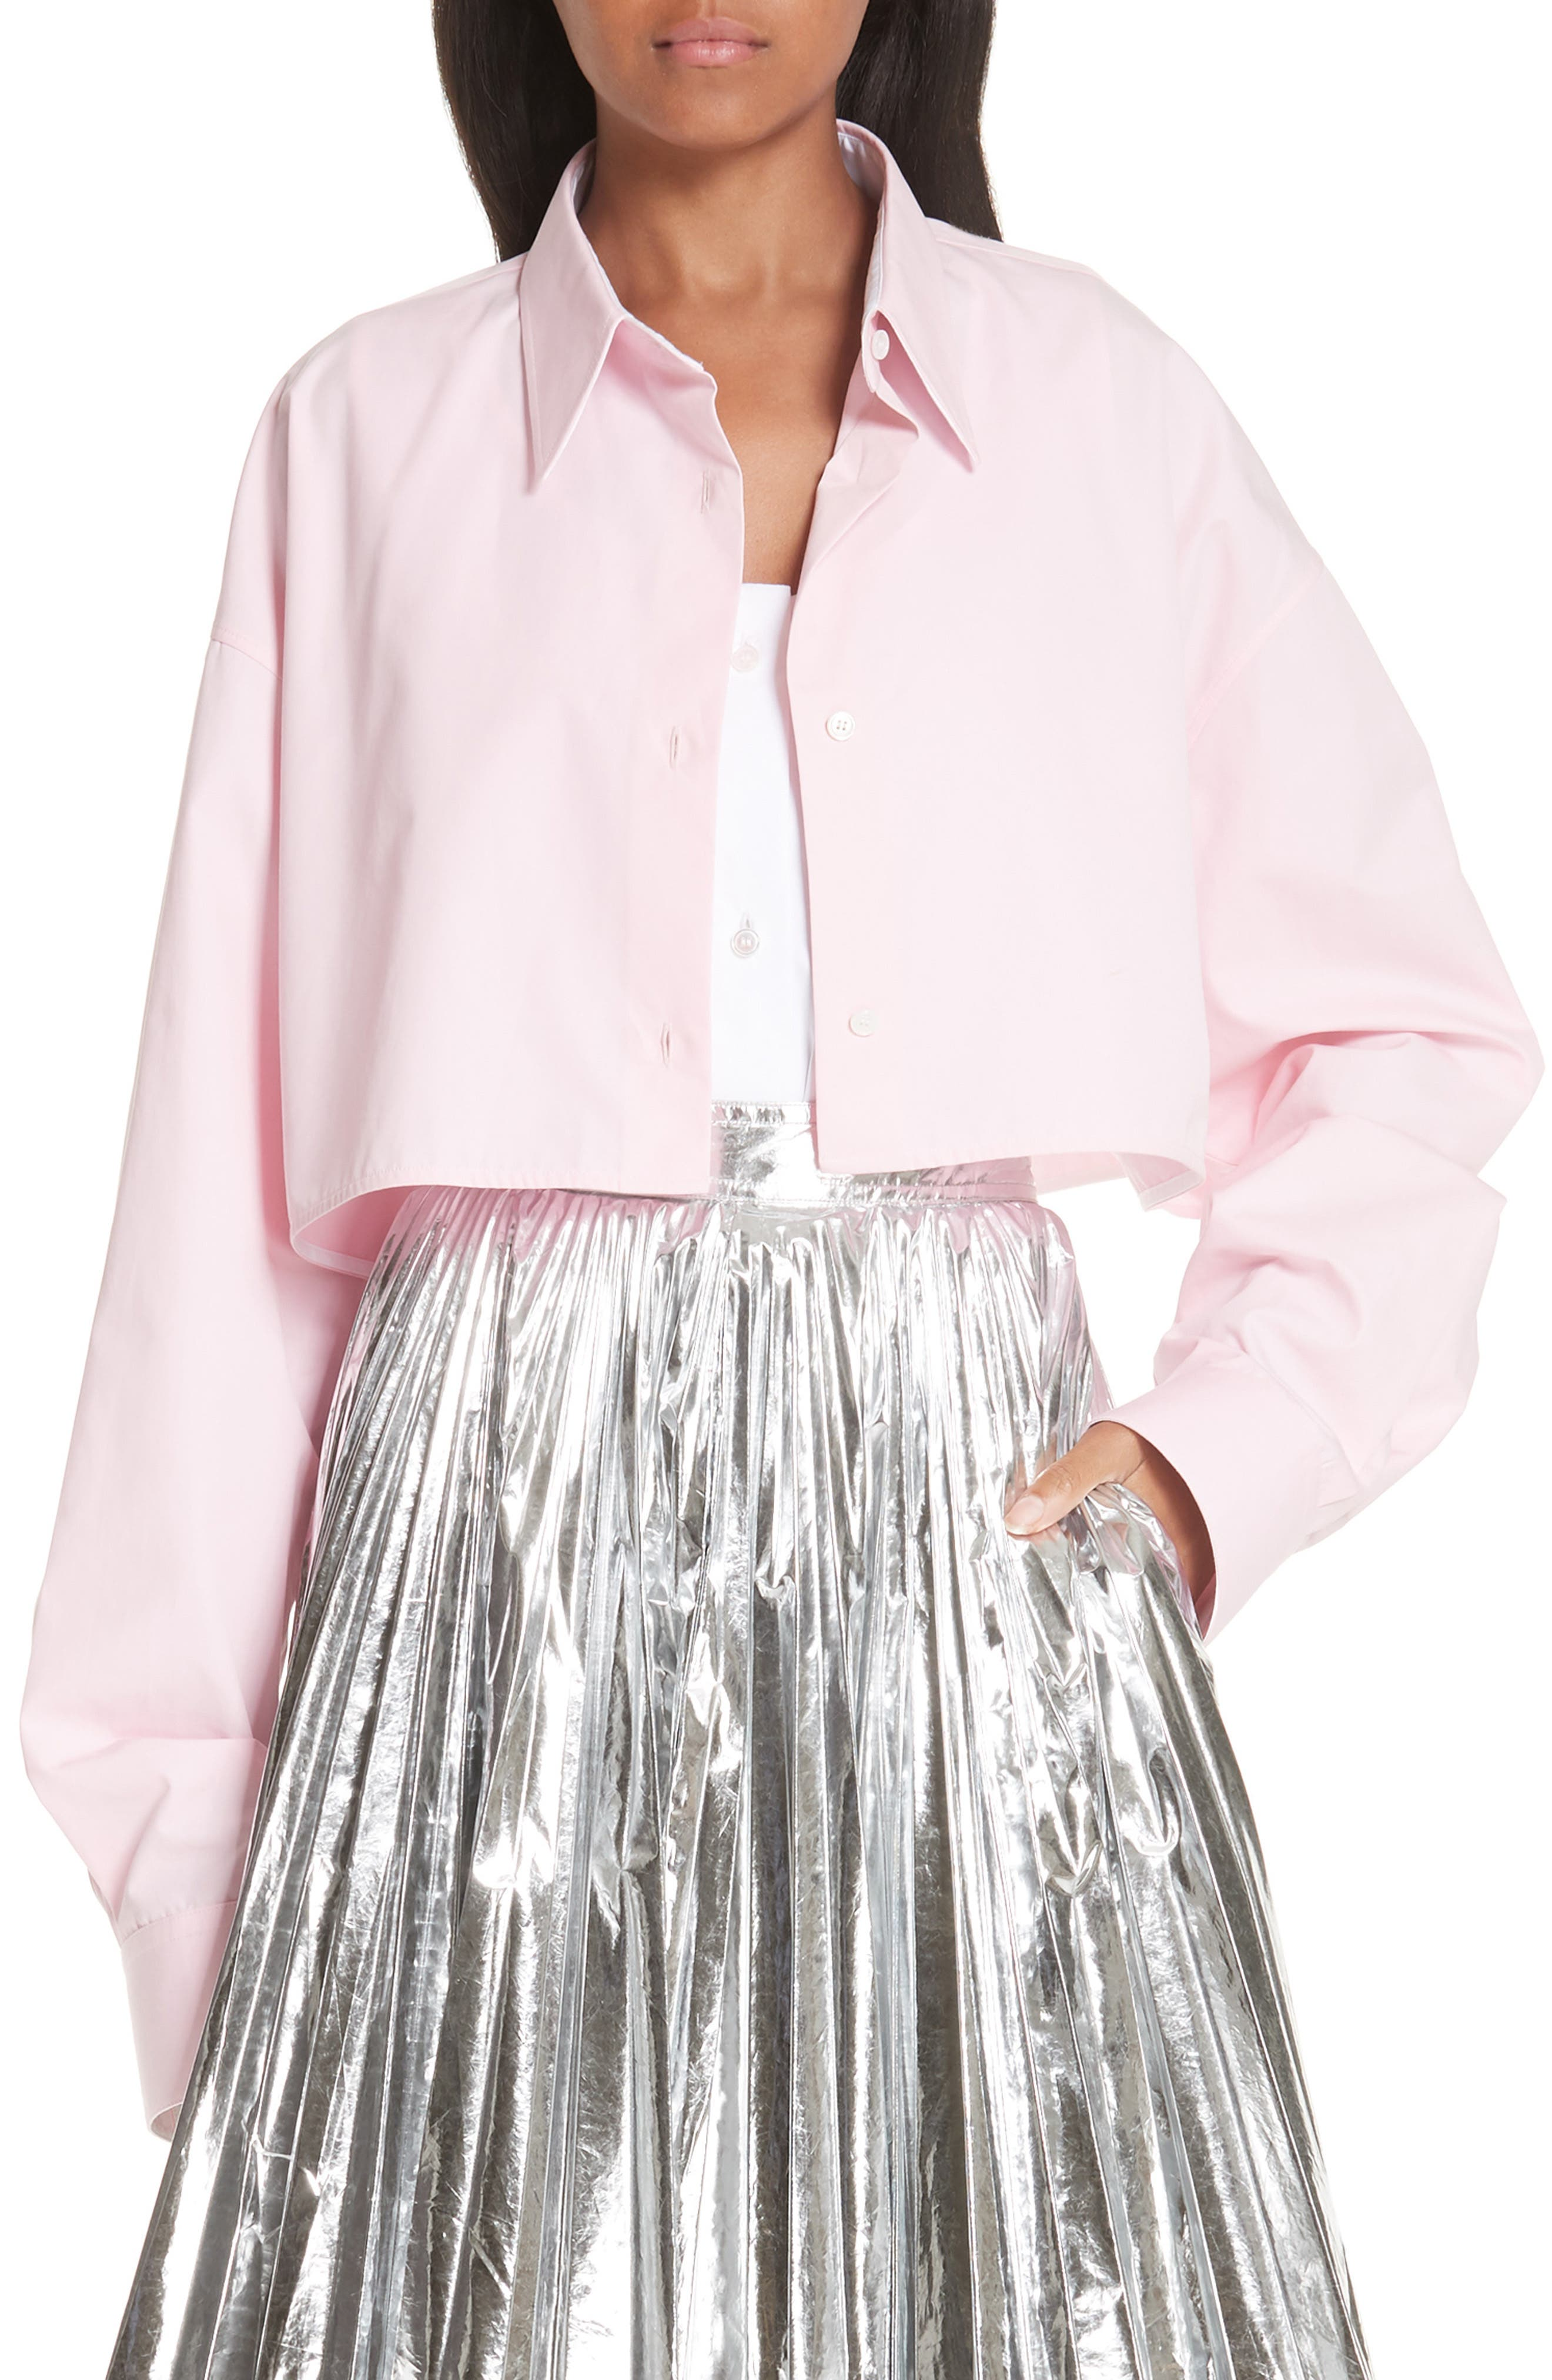 CALVIN KLEIN 205W39NYC, Layered Cotton Poplin Shirt, Main thumbnail 1, color, ROSE OPTIC WHITE